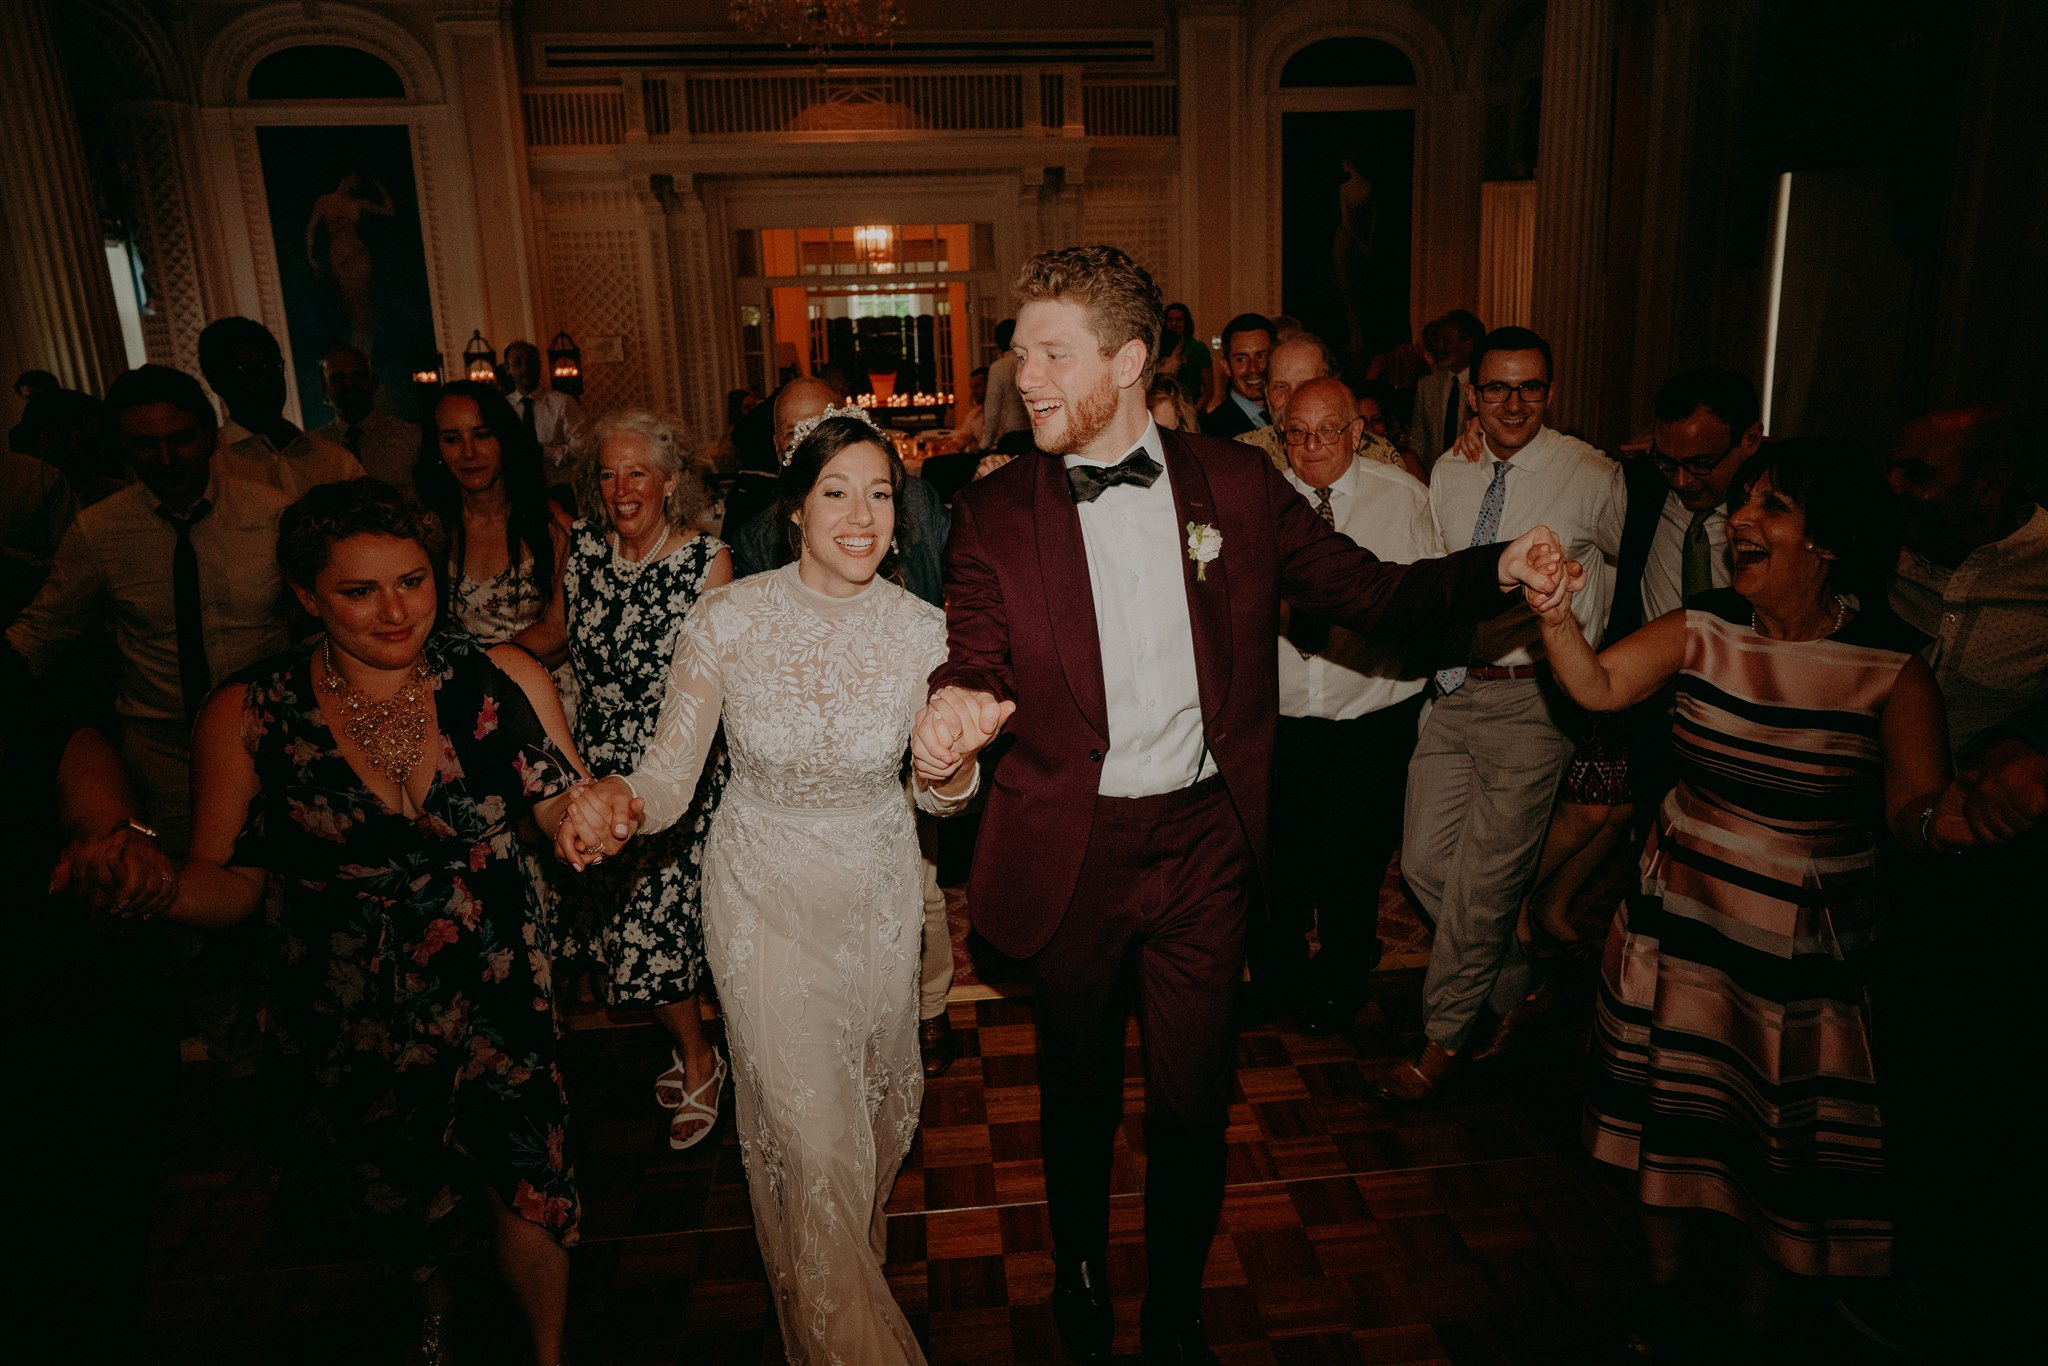 Chellise_Michael_Photography_Hudson_Valley_Wedding_Photographer_Otesaga_Hotel-6017.jpg